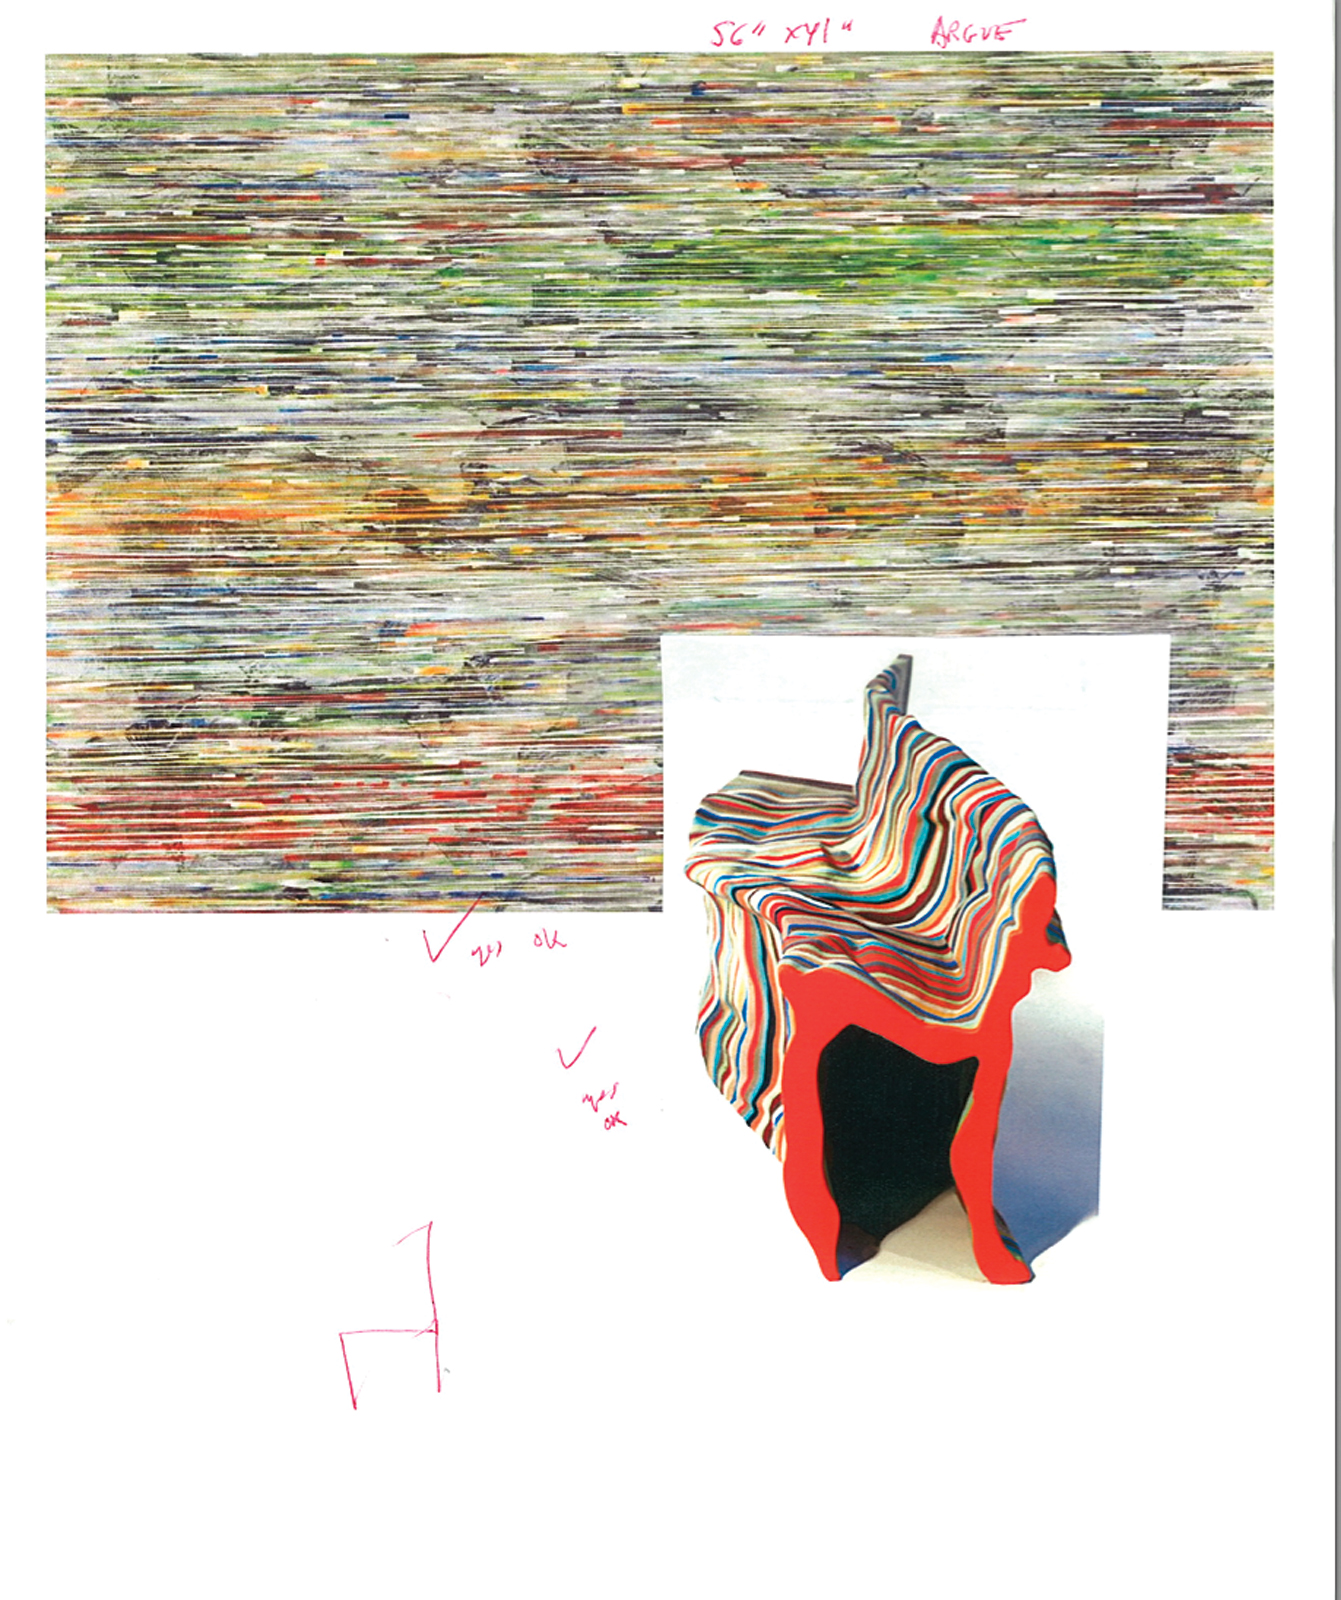 Doug Argue painting and Julien Carretero bench